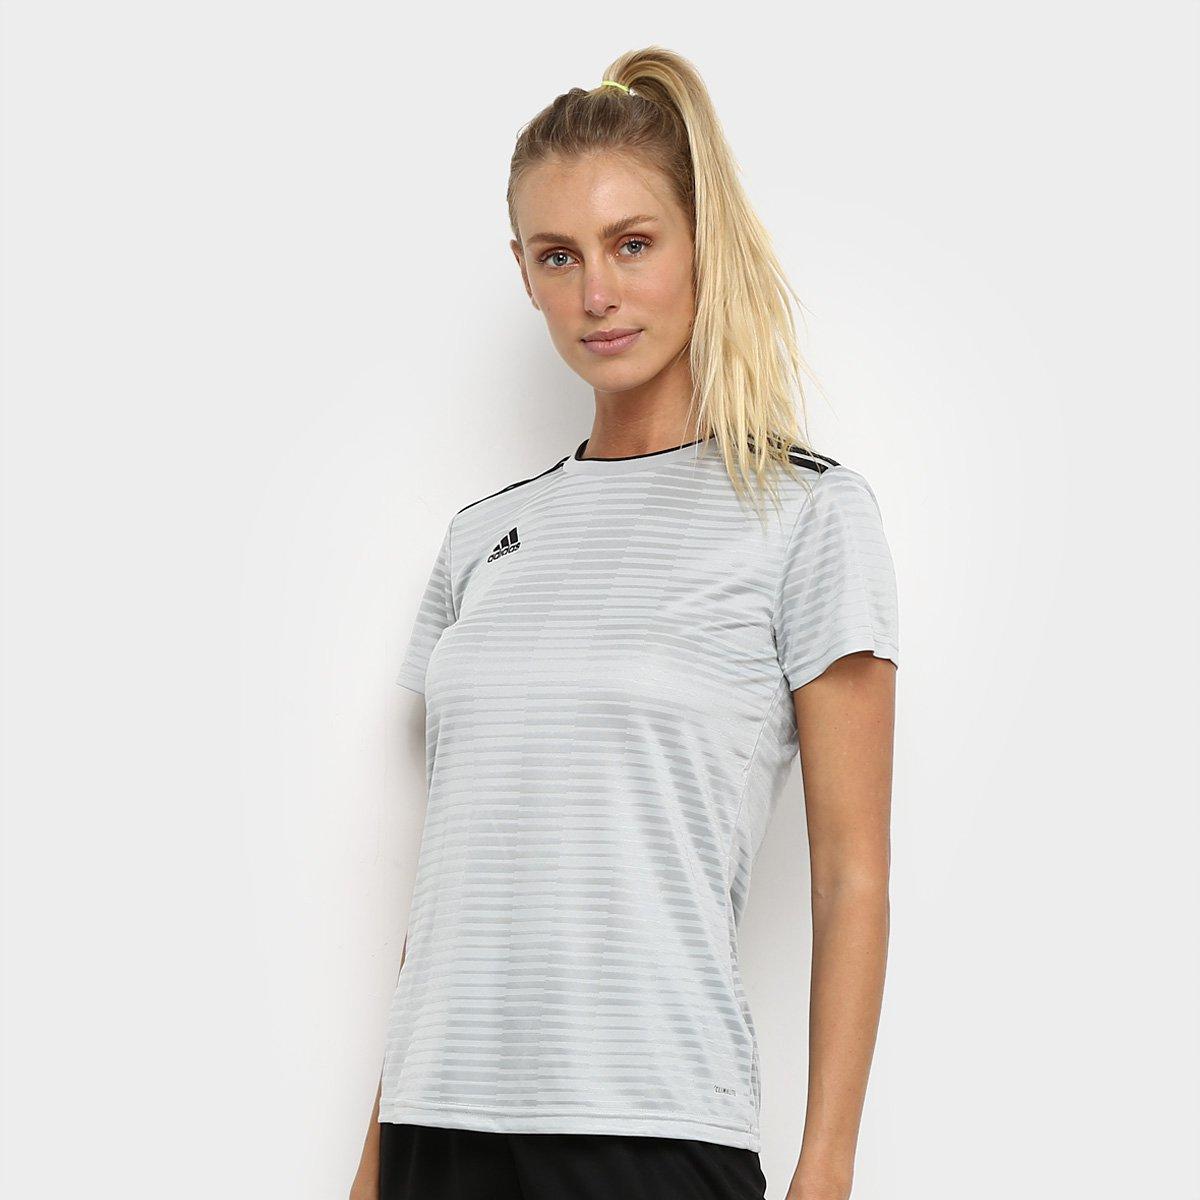 Camisa Adidas Condivo 18 Feminina